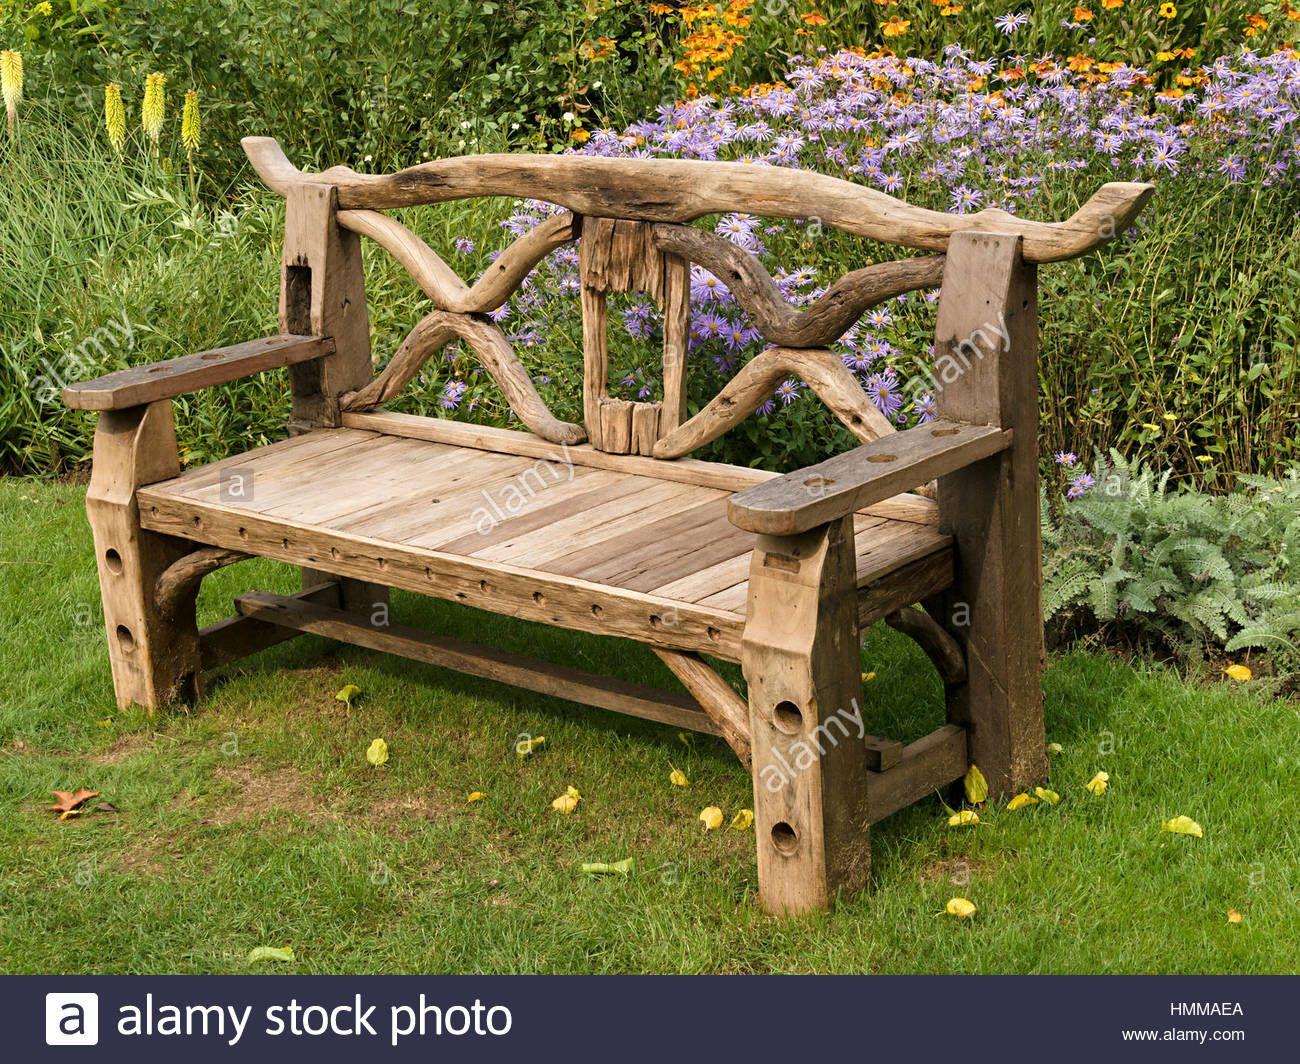 Enhance Your Garden With Wooden Garden Benches Decorifusta In 2020 Wooden Bench Outdoor Rustic Wooden Bench Rustic Wood Bench